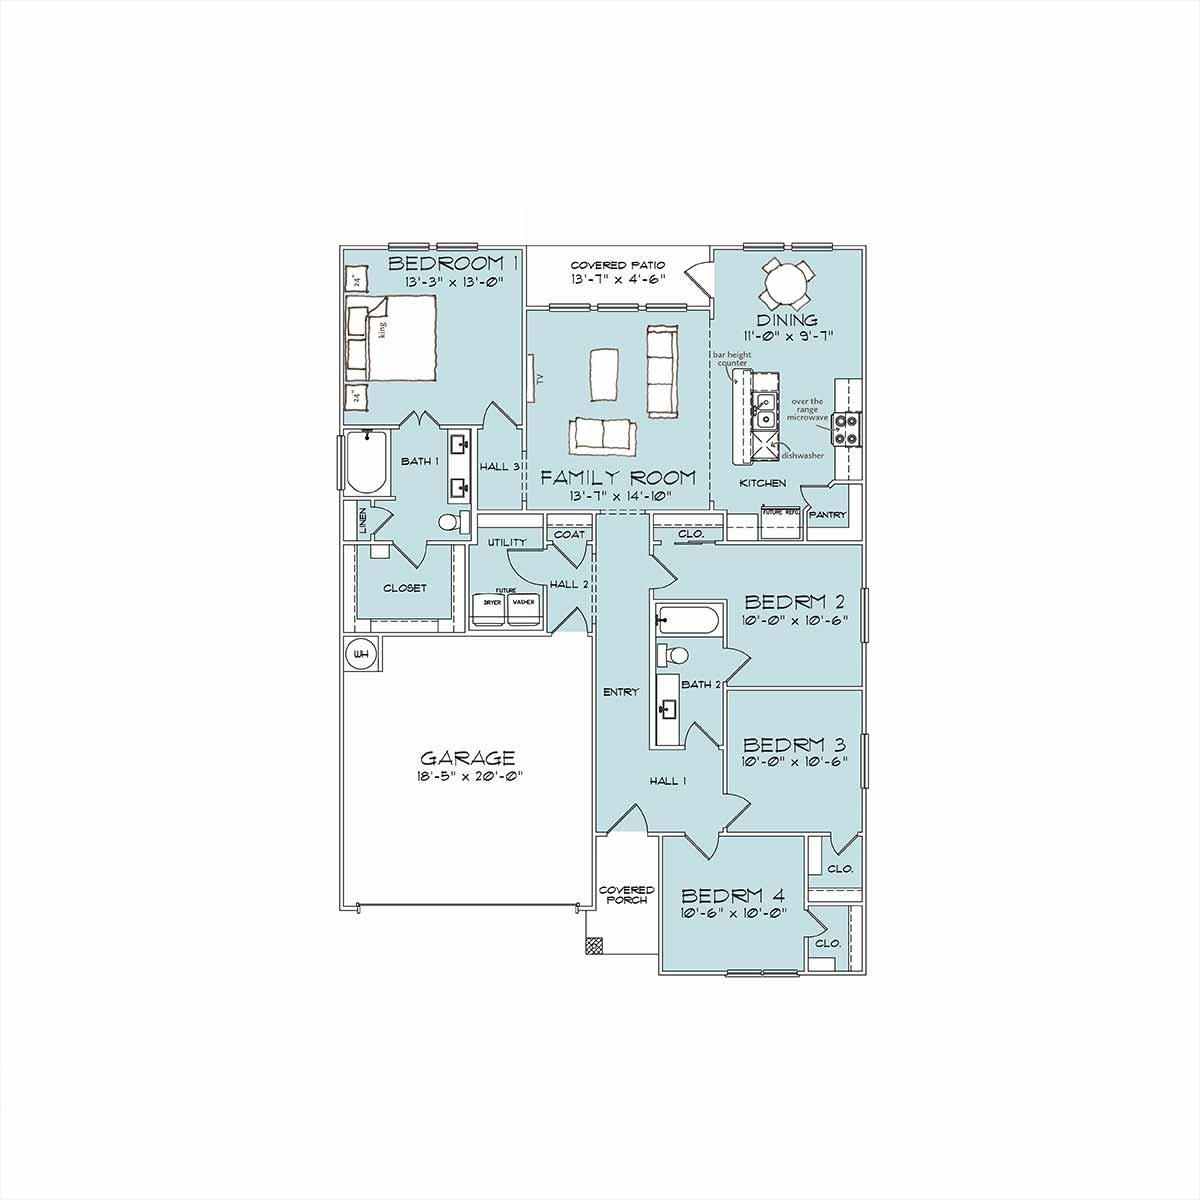 South Ridge Floor Plans: 7505 Hickman St, Temple TX